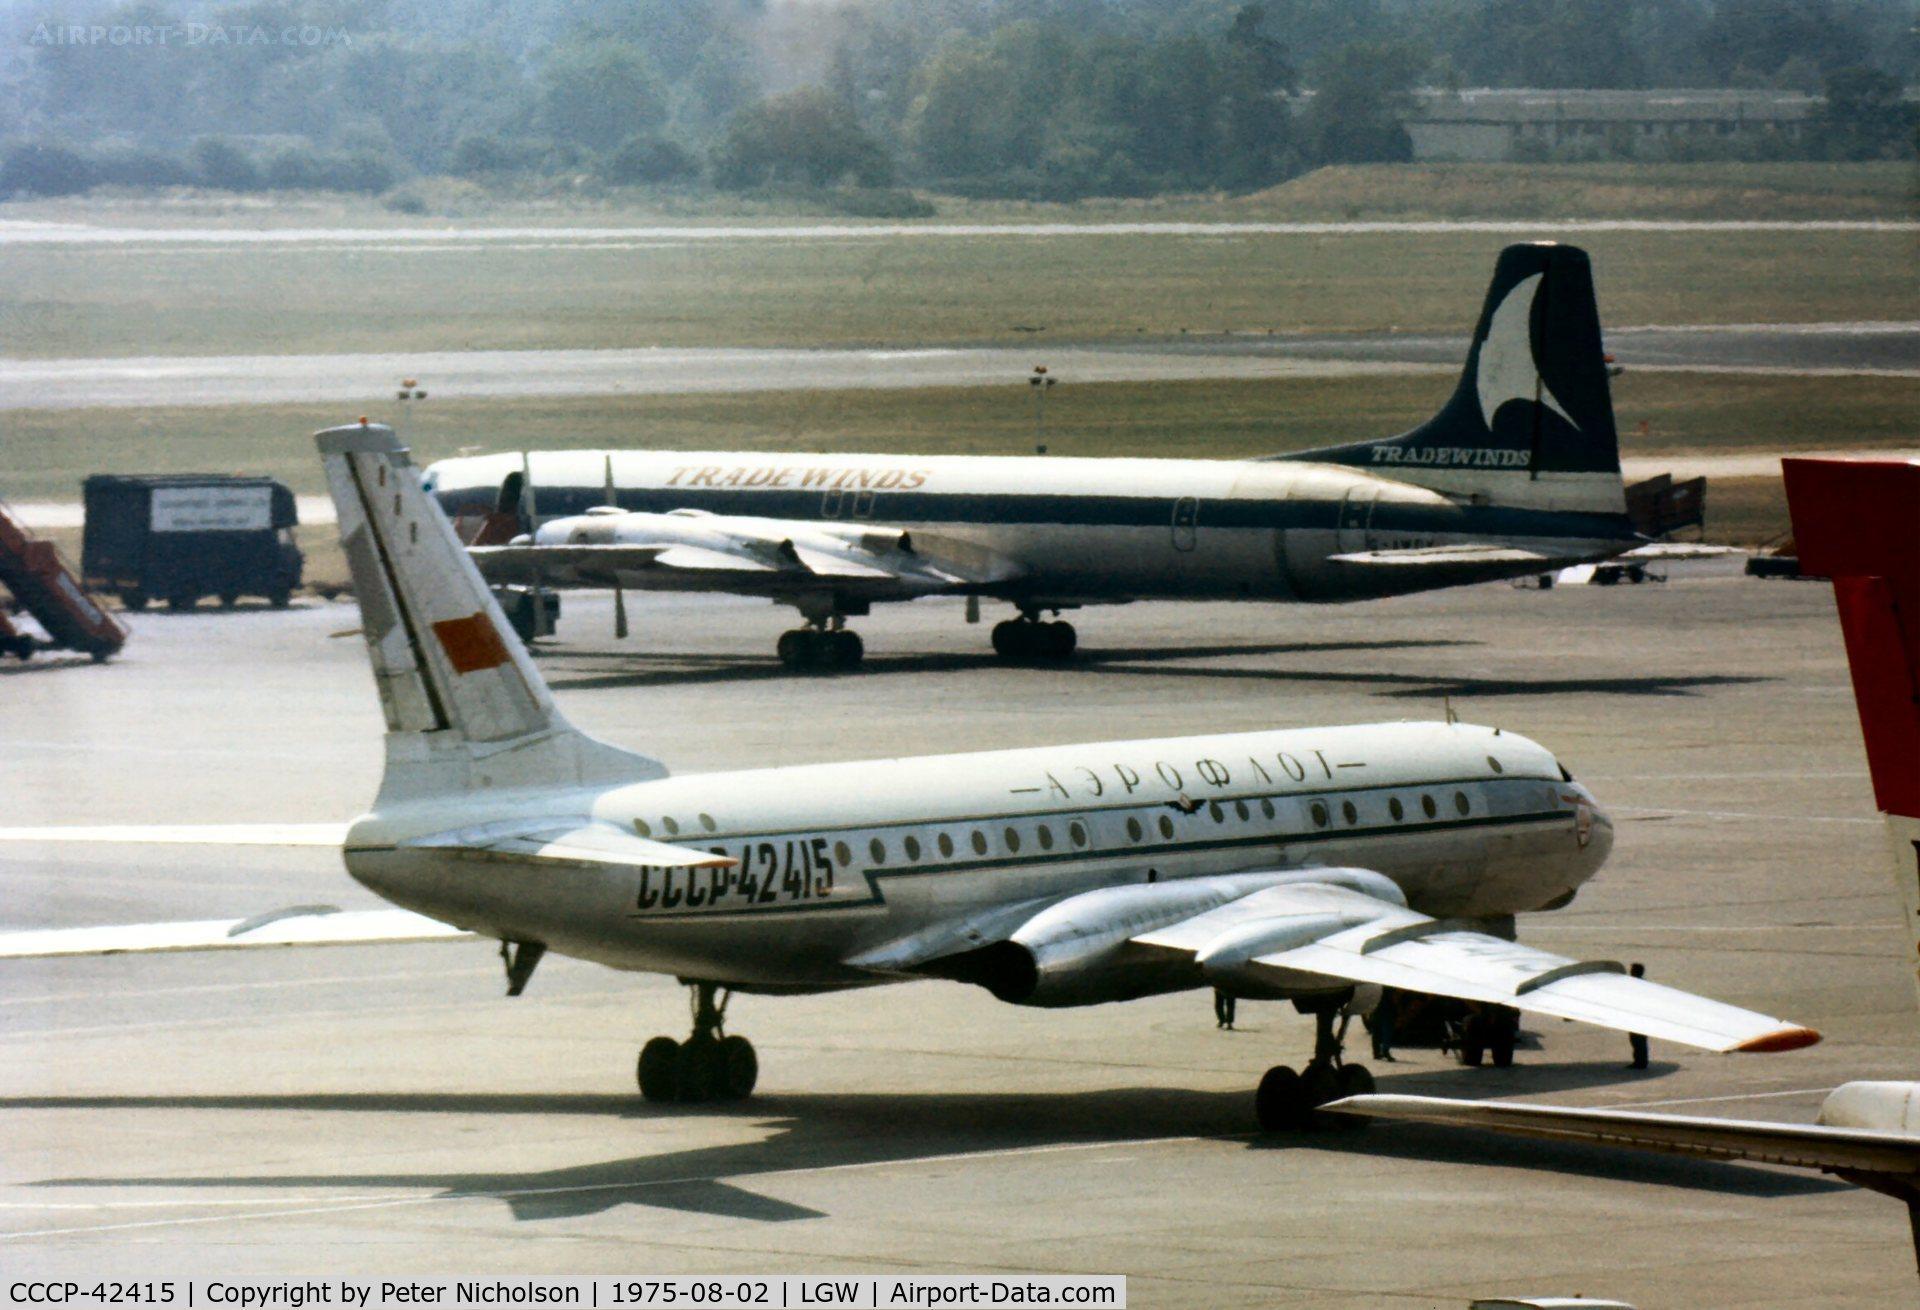 CCCP-42415, 1959 Tupolev Tu-104B C/N 920402, Tu-104 Camel of Aeroflot at London Gatwick in the Summer of 1975.